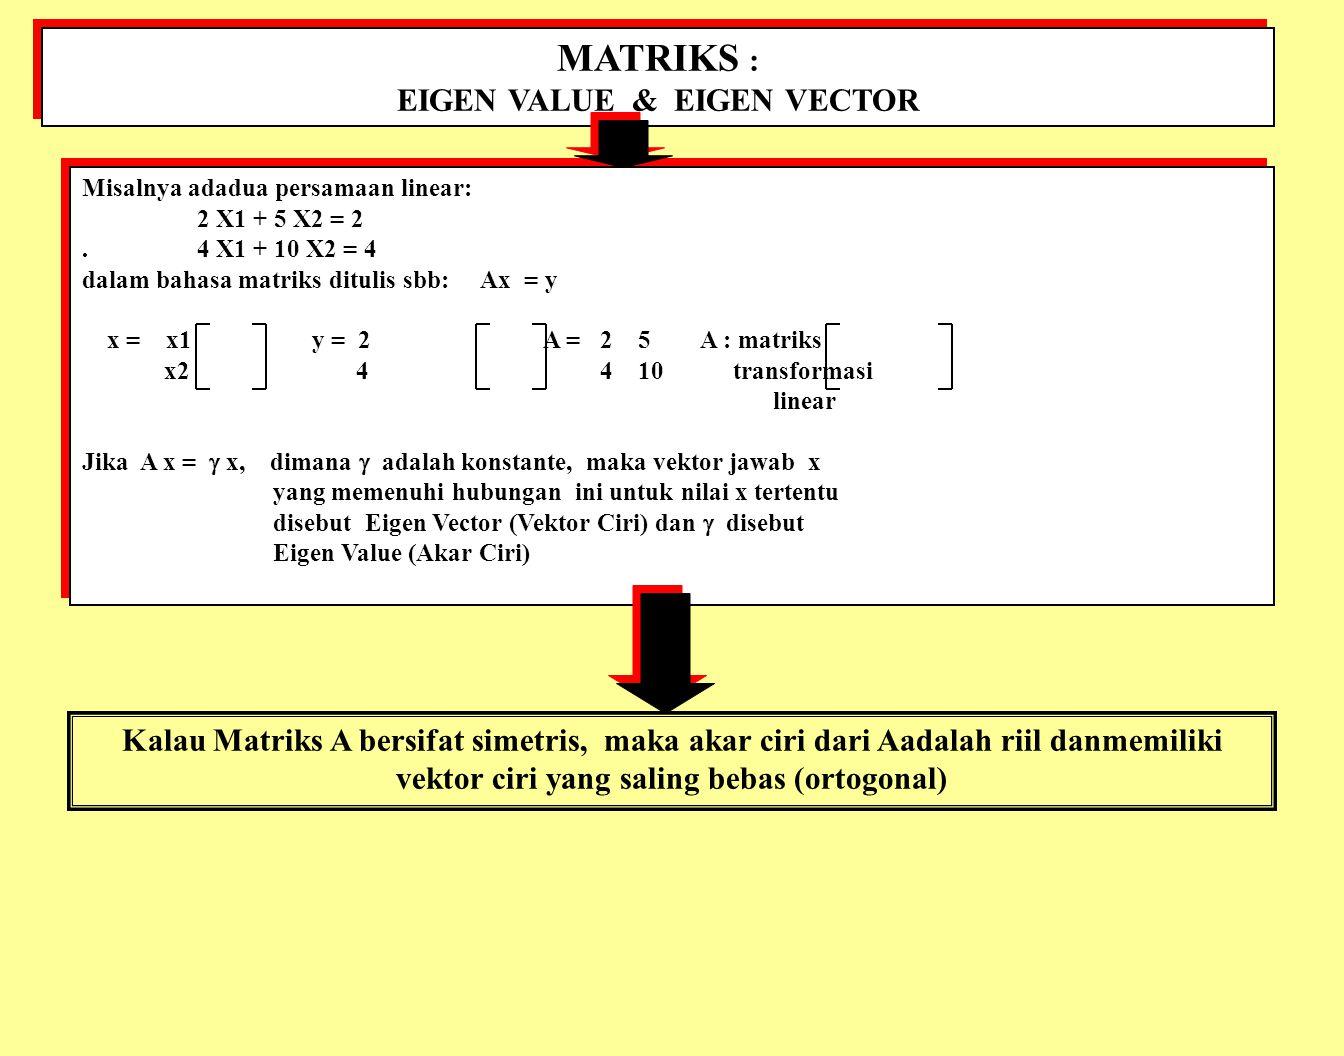 MATRIKS : EIGEN VALUE & EIGEN VECTOR MATRIKS : EIGEN VALUE & EIGEN VECTOR Misalnya adadua persamaan linear: 2 X1 + 5 X2 = 2.4 X1 + 10 X2 = 4 dalam bahasa matriks ditulis sbb: Ax = y x = x1y = 2A = 2 5 A : matriks x2 4 4 10 transformasi linear Jika A x =  x, dimana  adalah konstante, maka vektor jawab x yang memenuhi hubungan ini untuk nilai x tertentu disebut Eigen Vector (Vektor Ciri) dan  disebut Eigen Value (Akar Ciri) Misalnya adadua persamaan linear: 2 X1 + 5 X2 = 2.4 X1 + 10 X2 = 4 dalam bahasa matriks ditulis sbb: Ax = y x = x1y = 2A = 2 5 A : matriks x2 4 4 10 transformasi linear Jika A x =  x, dimana  adalah konstante, maka vektor jawab x yang memenuhi hubungan ini untuk nilai x tertentu disebut Eigen Vector (Vektor Ciri) dan  disebut Eigen Value (Akar Ciri) Kalau Matriks A bersifat simetris, maka akar ciri dari Aadalah riil danmemiliki vektor ciri yang saling bebas (ortogonal)